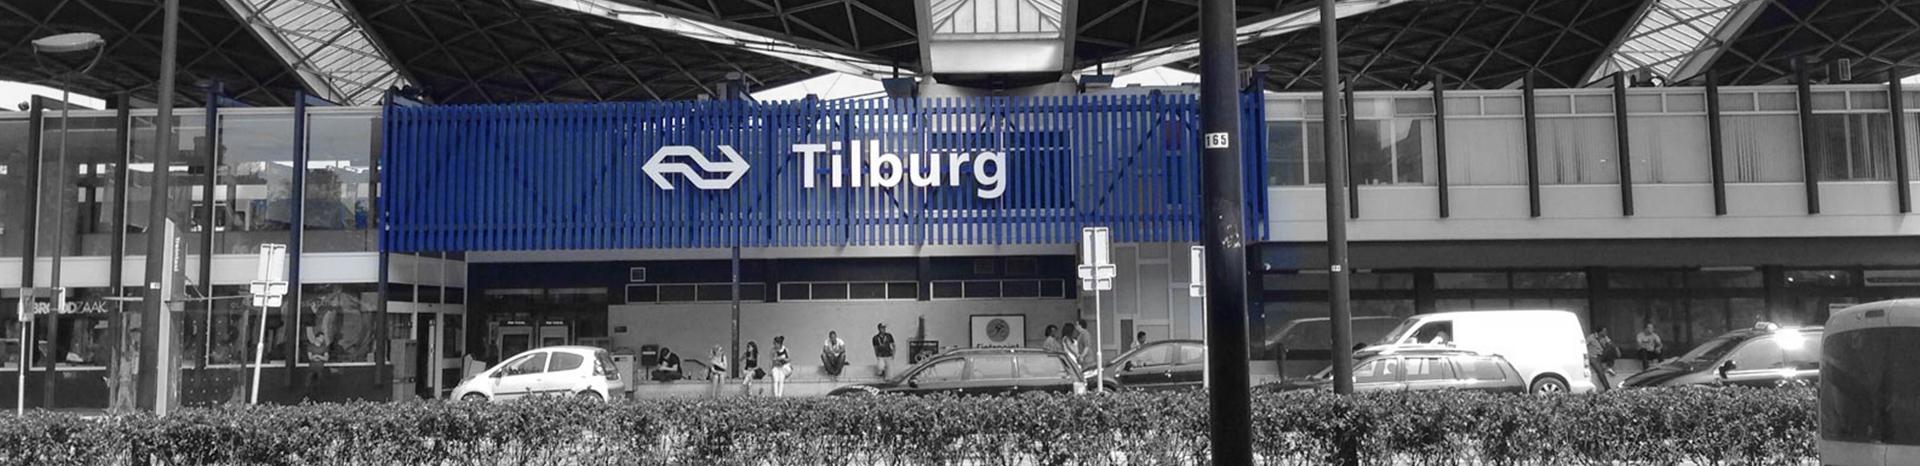 Letselschade advocaat Tilburg | LetselPro